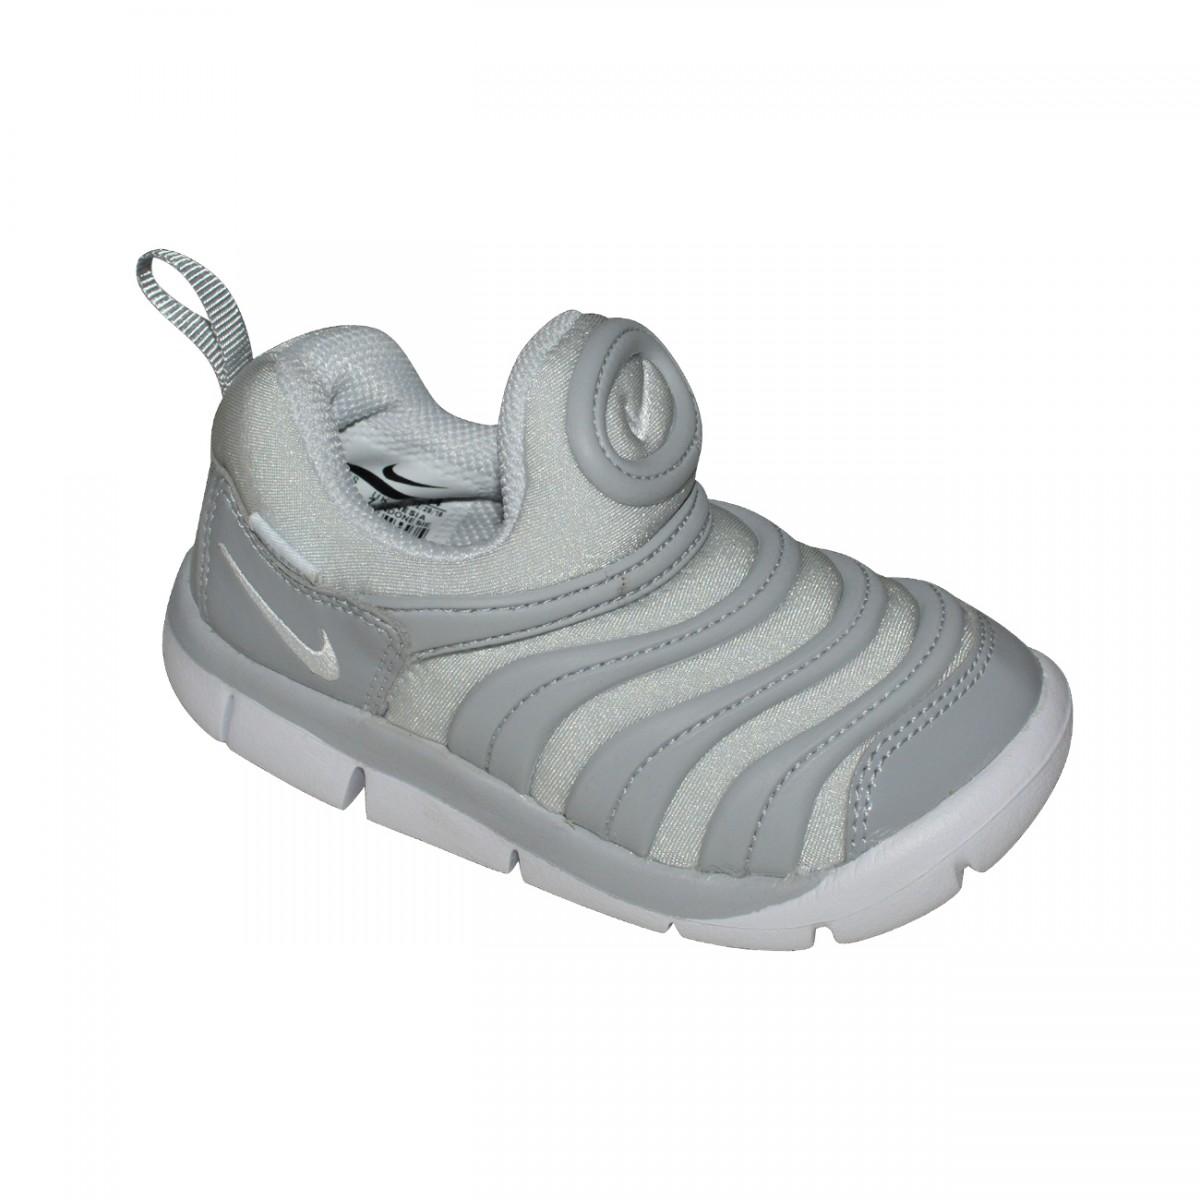 cf701083a0f Tenis Nike Dynamo Free TD Infantil 343938 011 - Cinza Cinza - Chuteira Nike